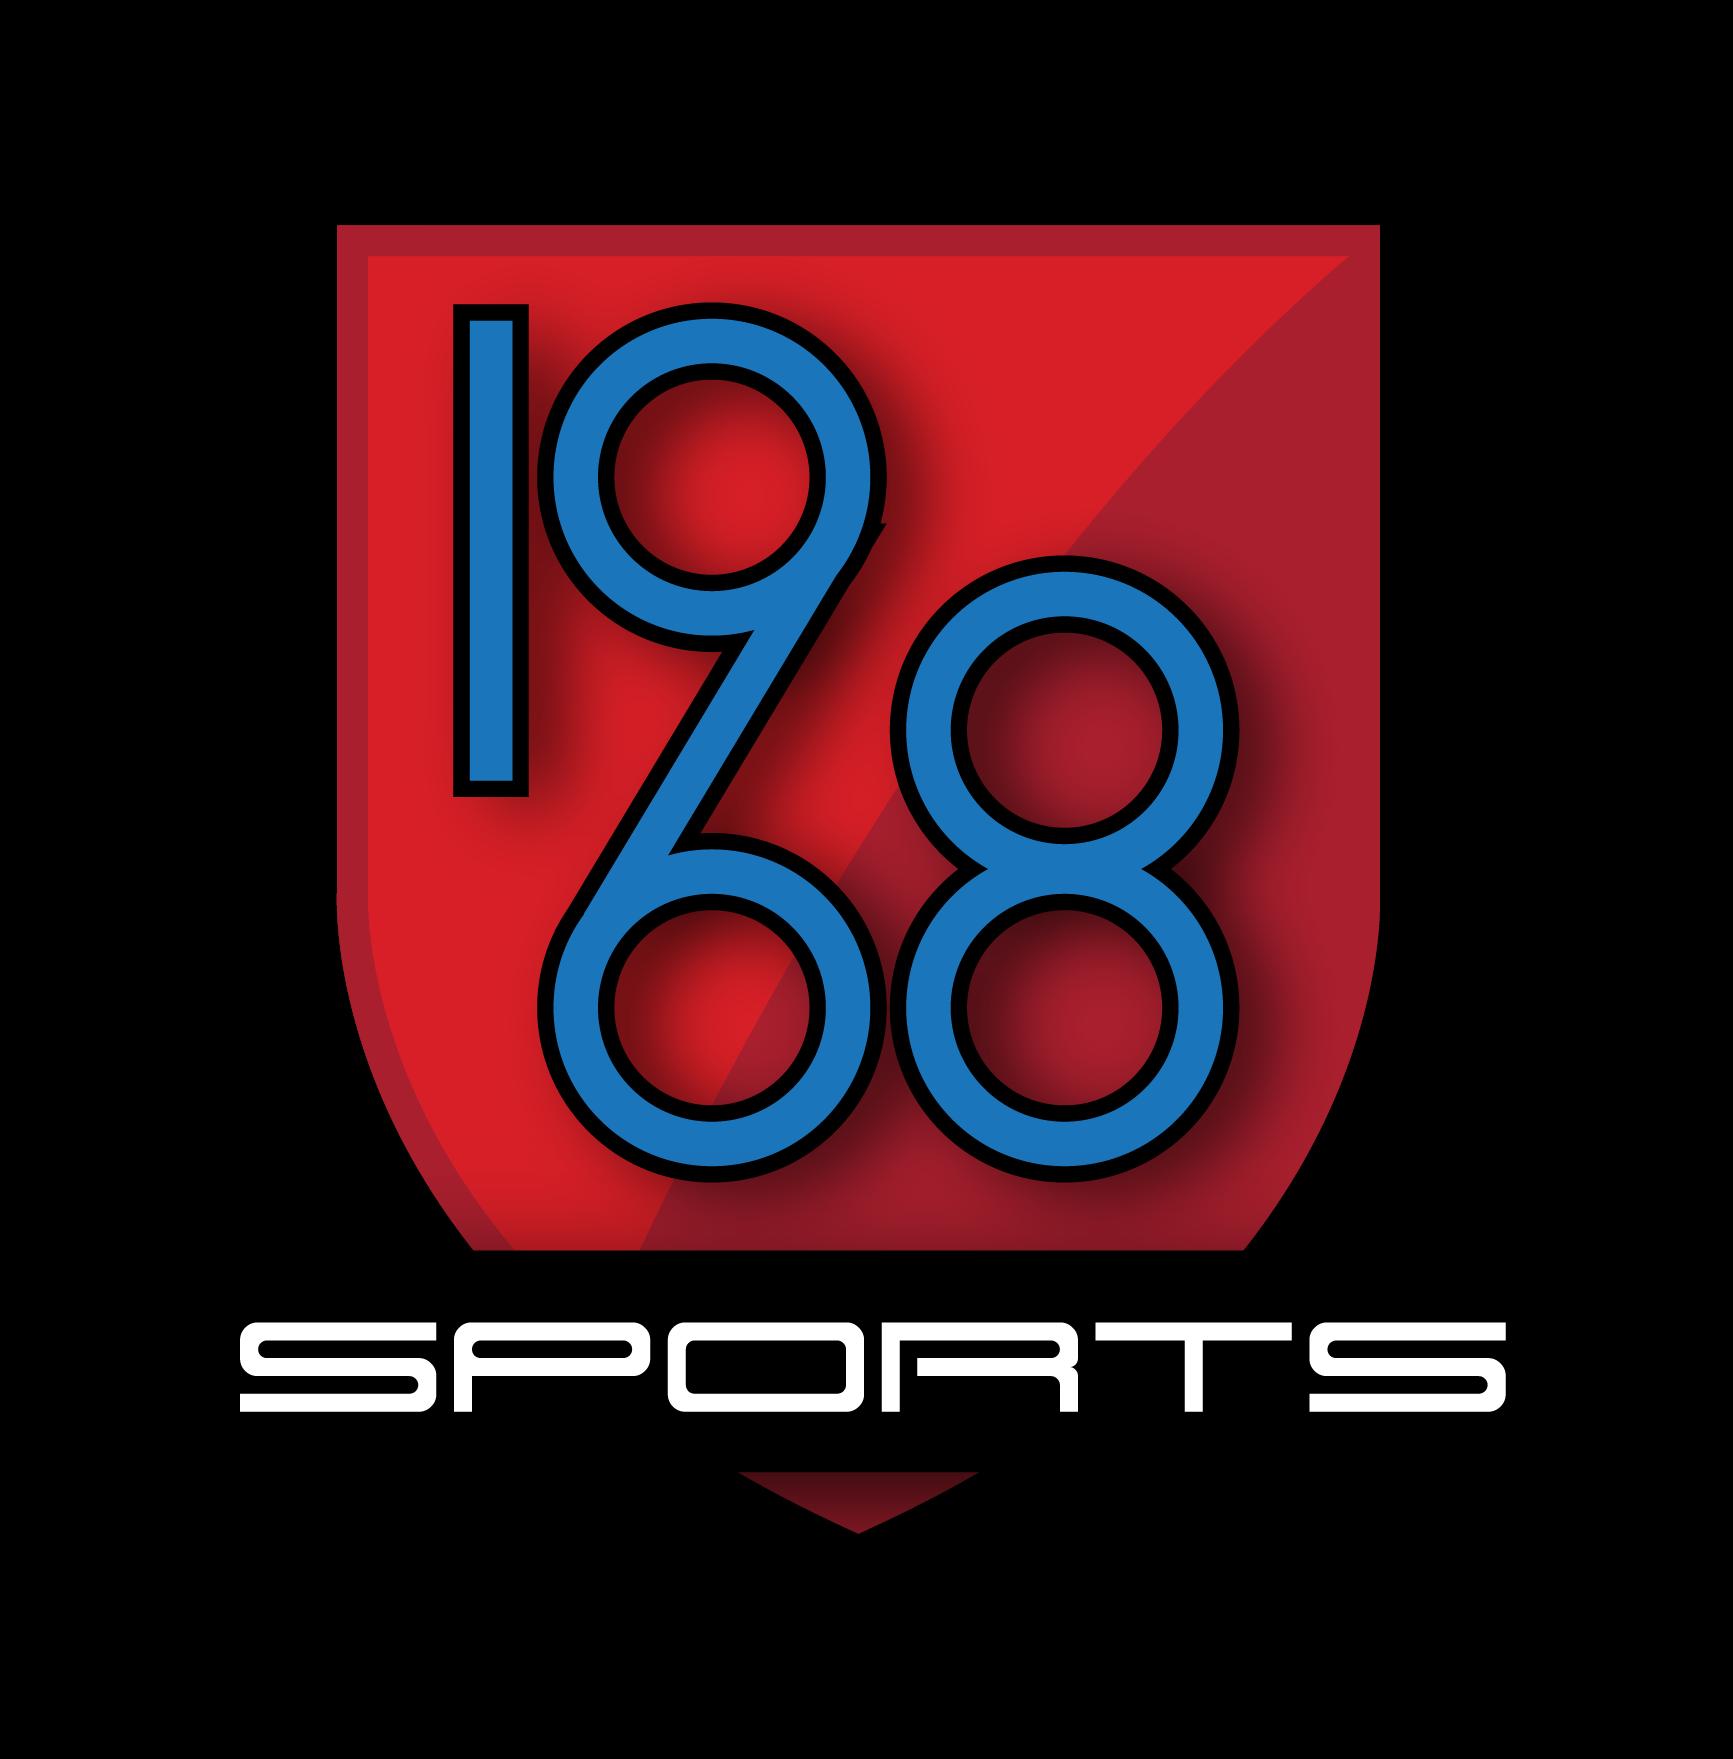 1968 sports Roberto Muñoz